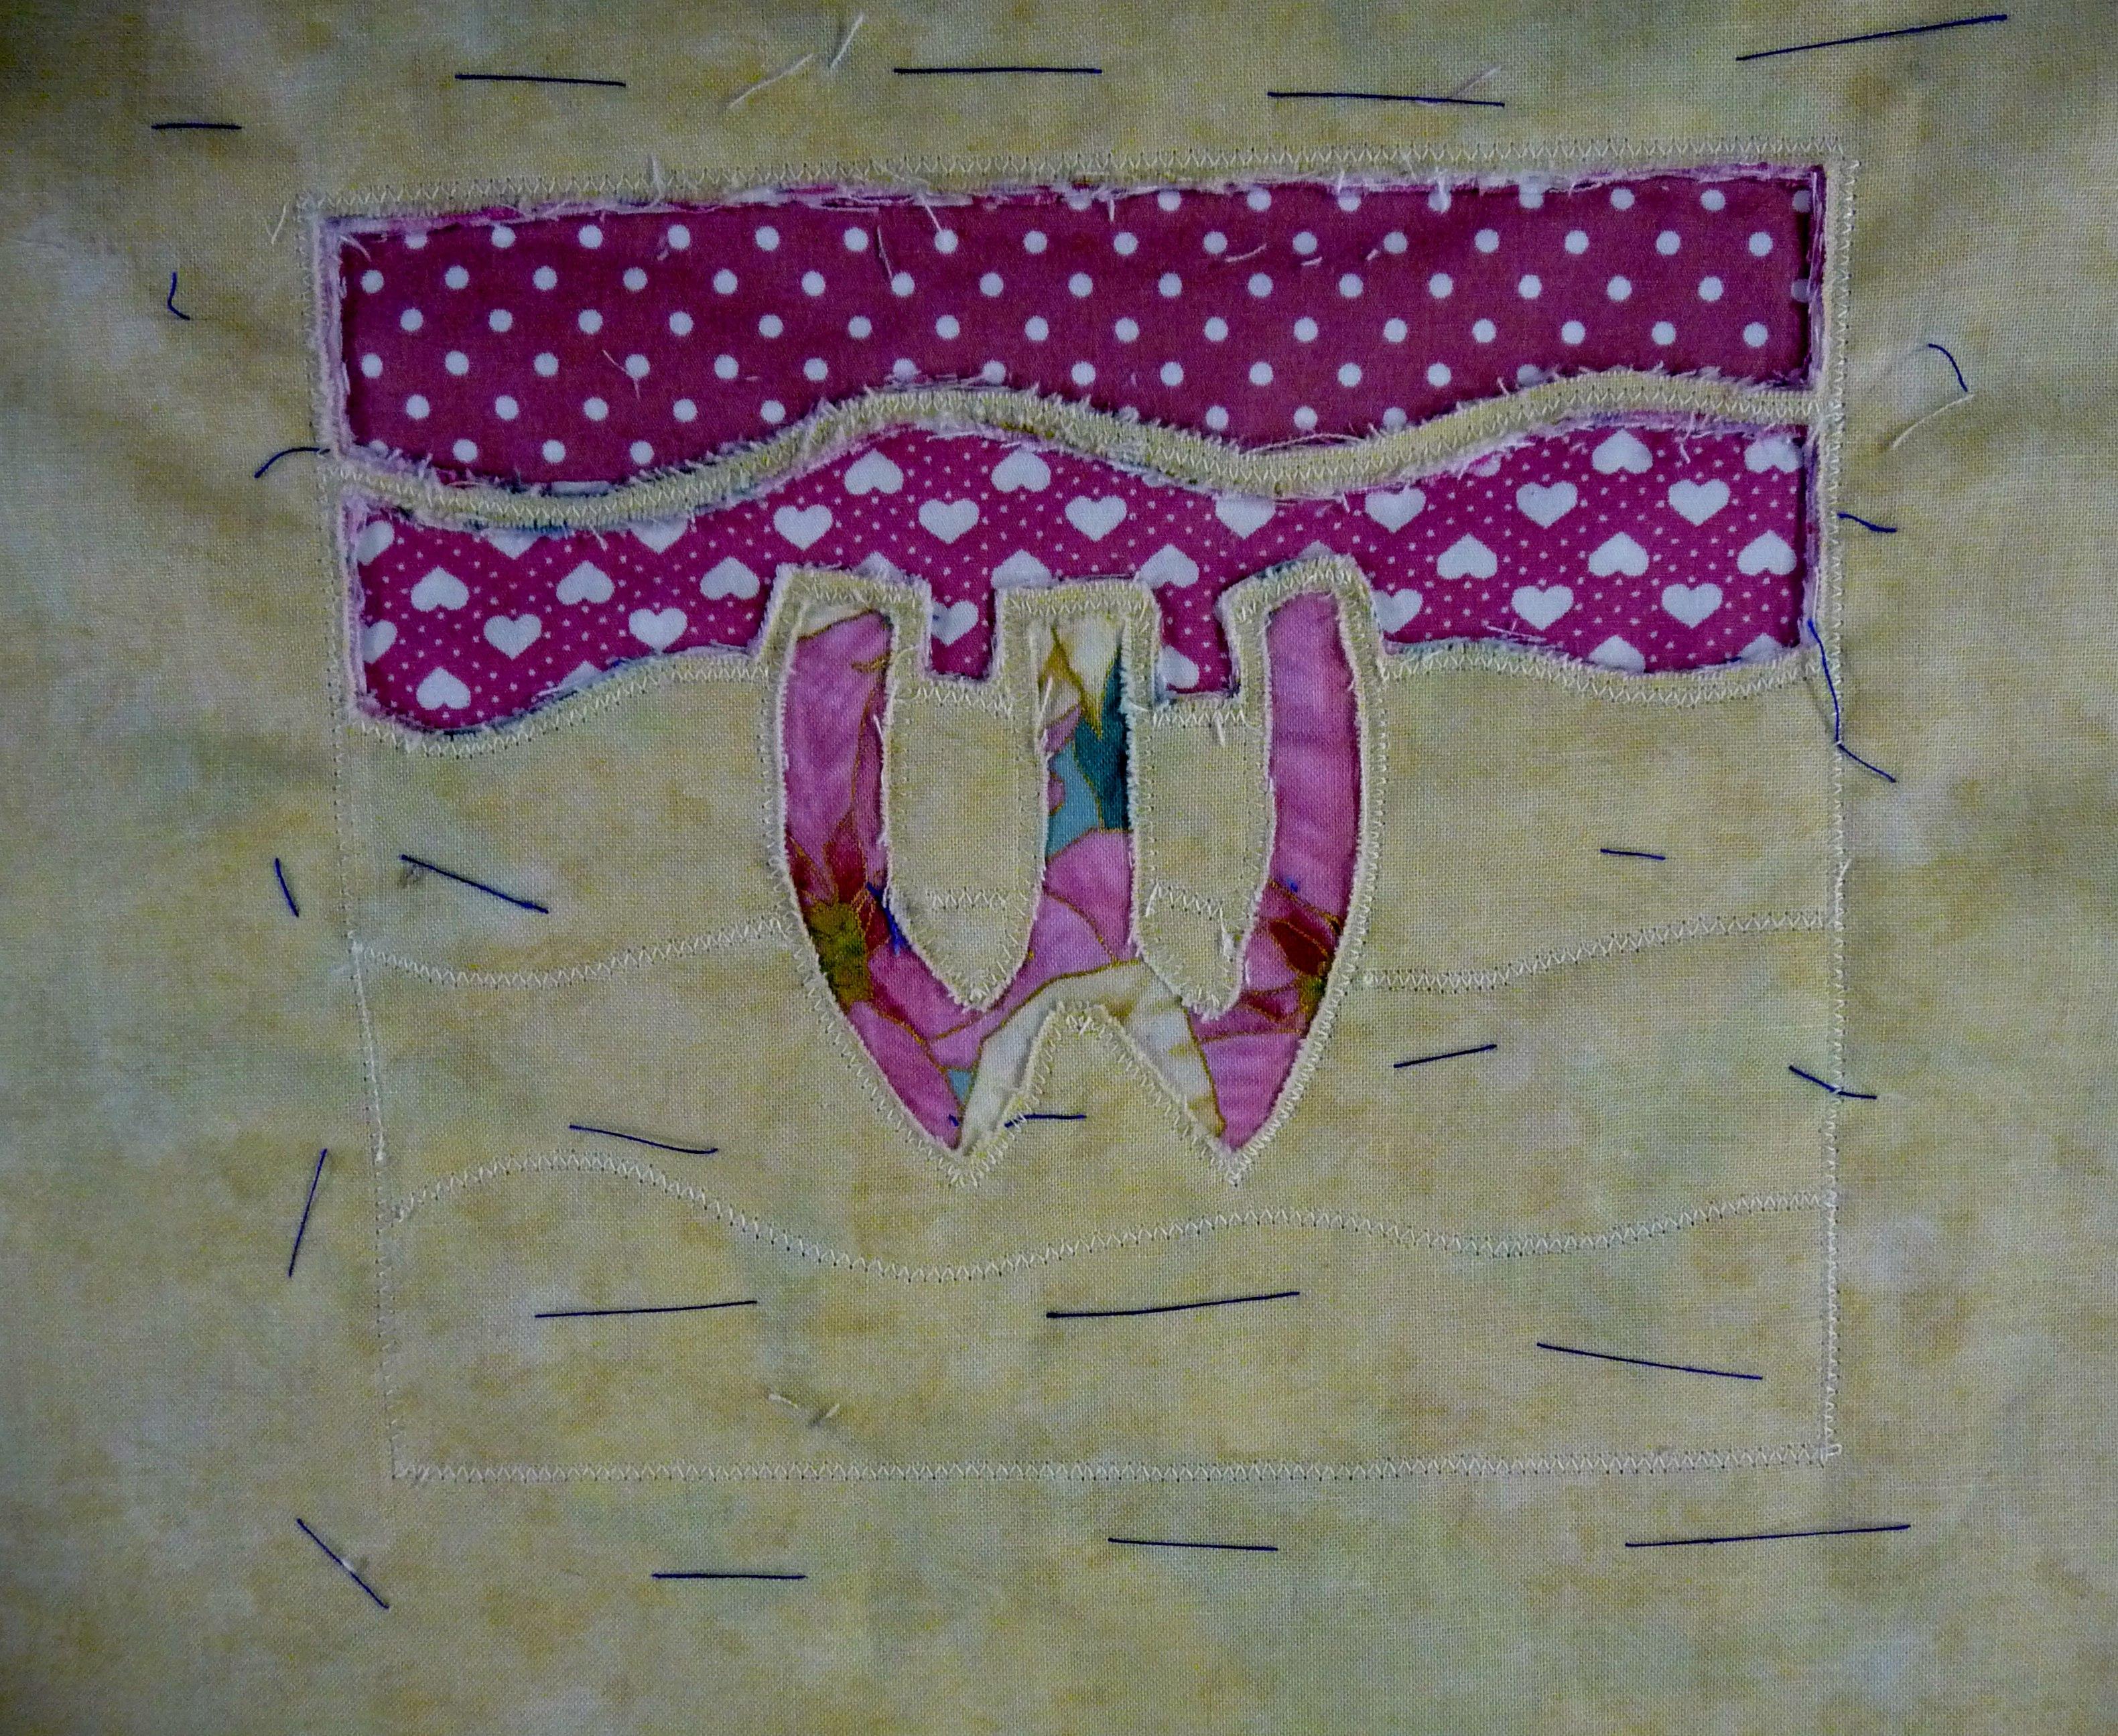 interesting use of patterned fabrics